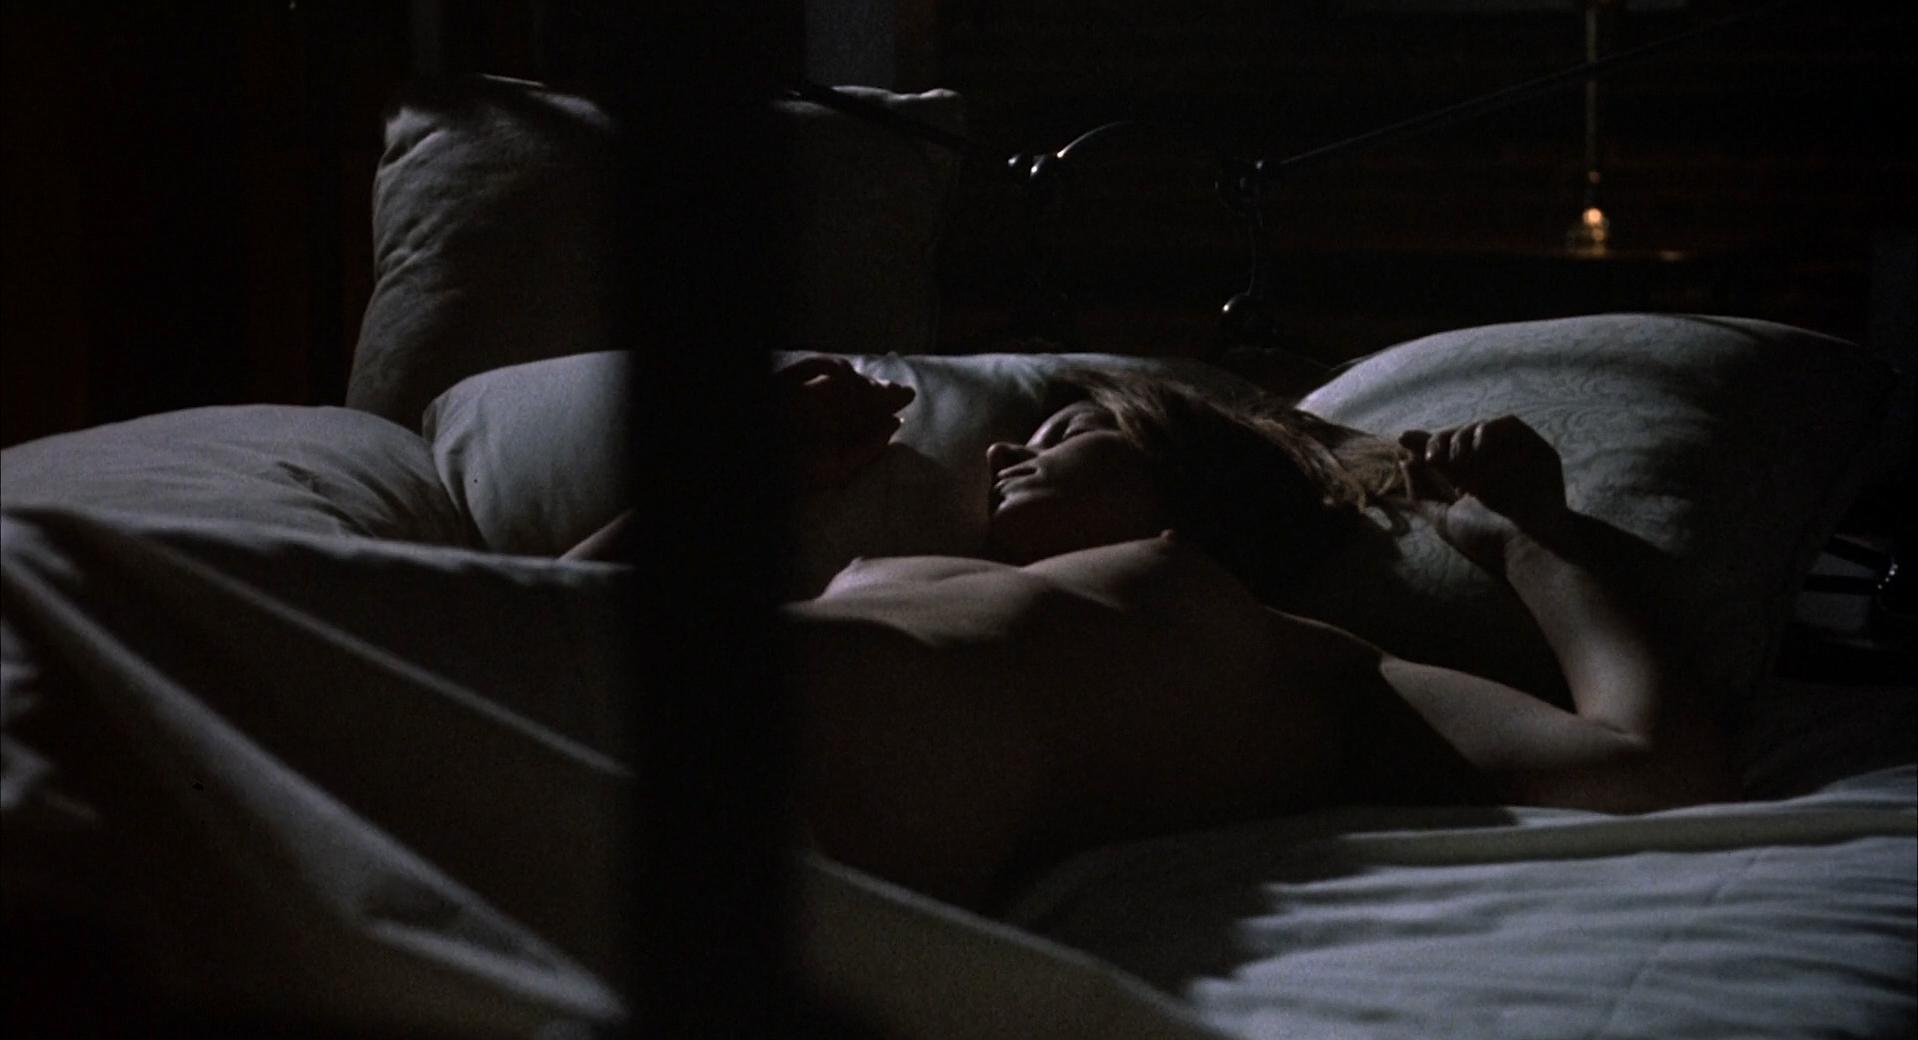 Lisa Zane nude, Adrienne Leigh nude, Charisse Glenn nude, Palmer Lee Todd nude - Bad Influence (1990)